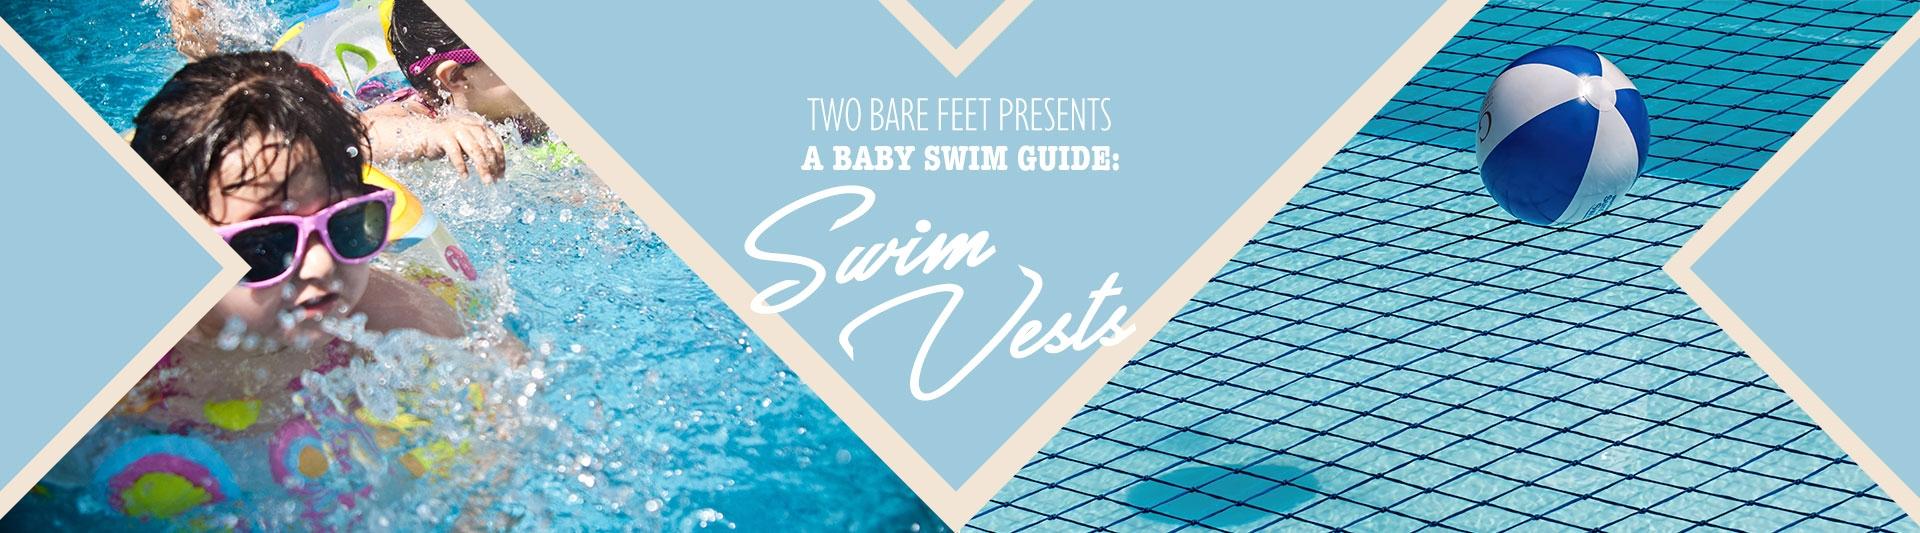 Baby Swim Vest banner